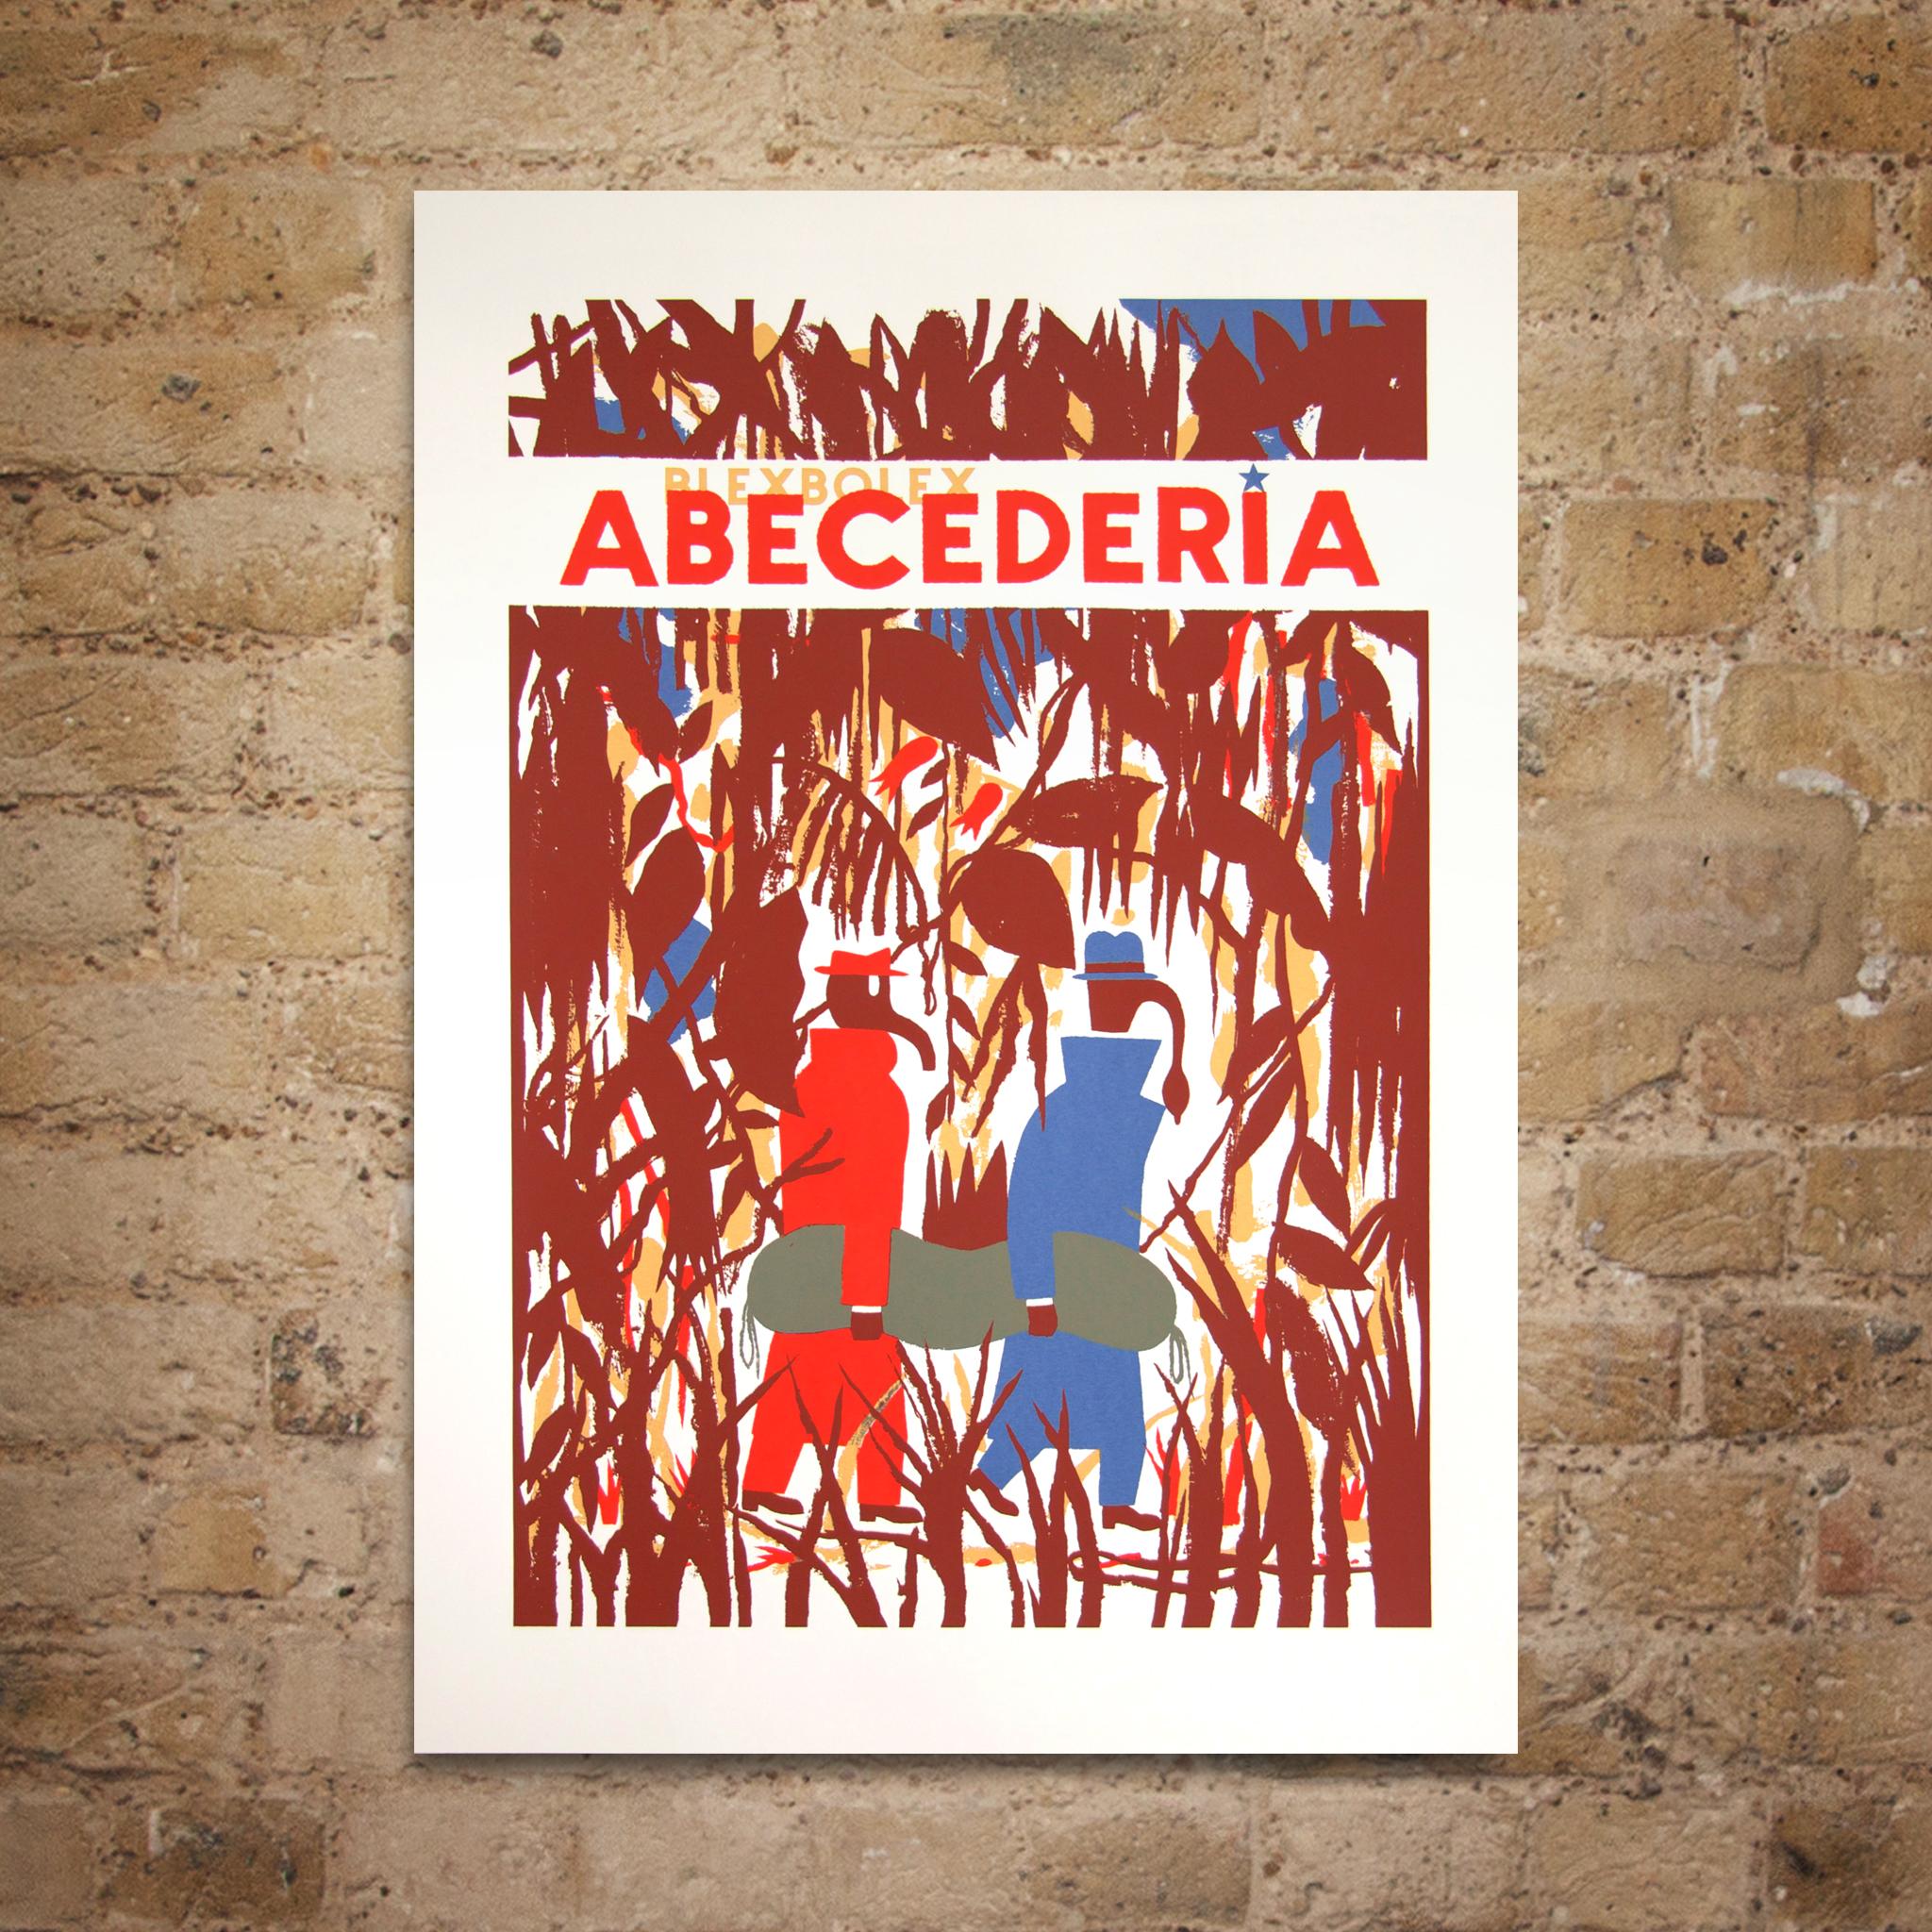 Abecederia Screenprint